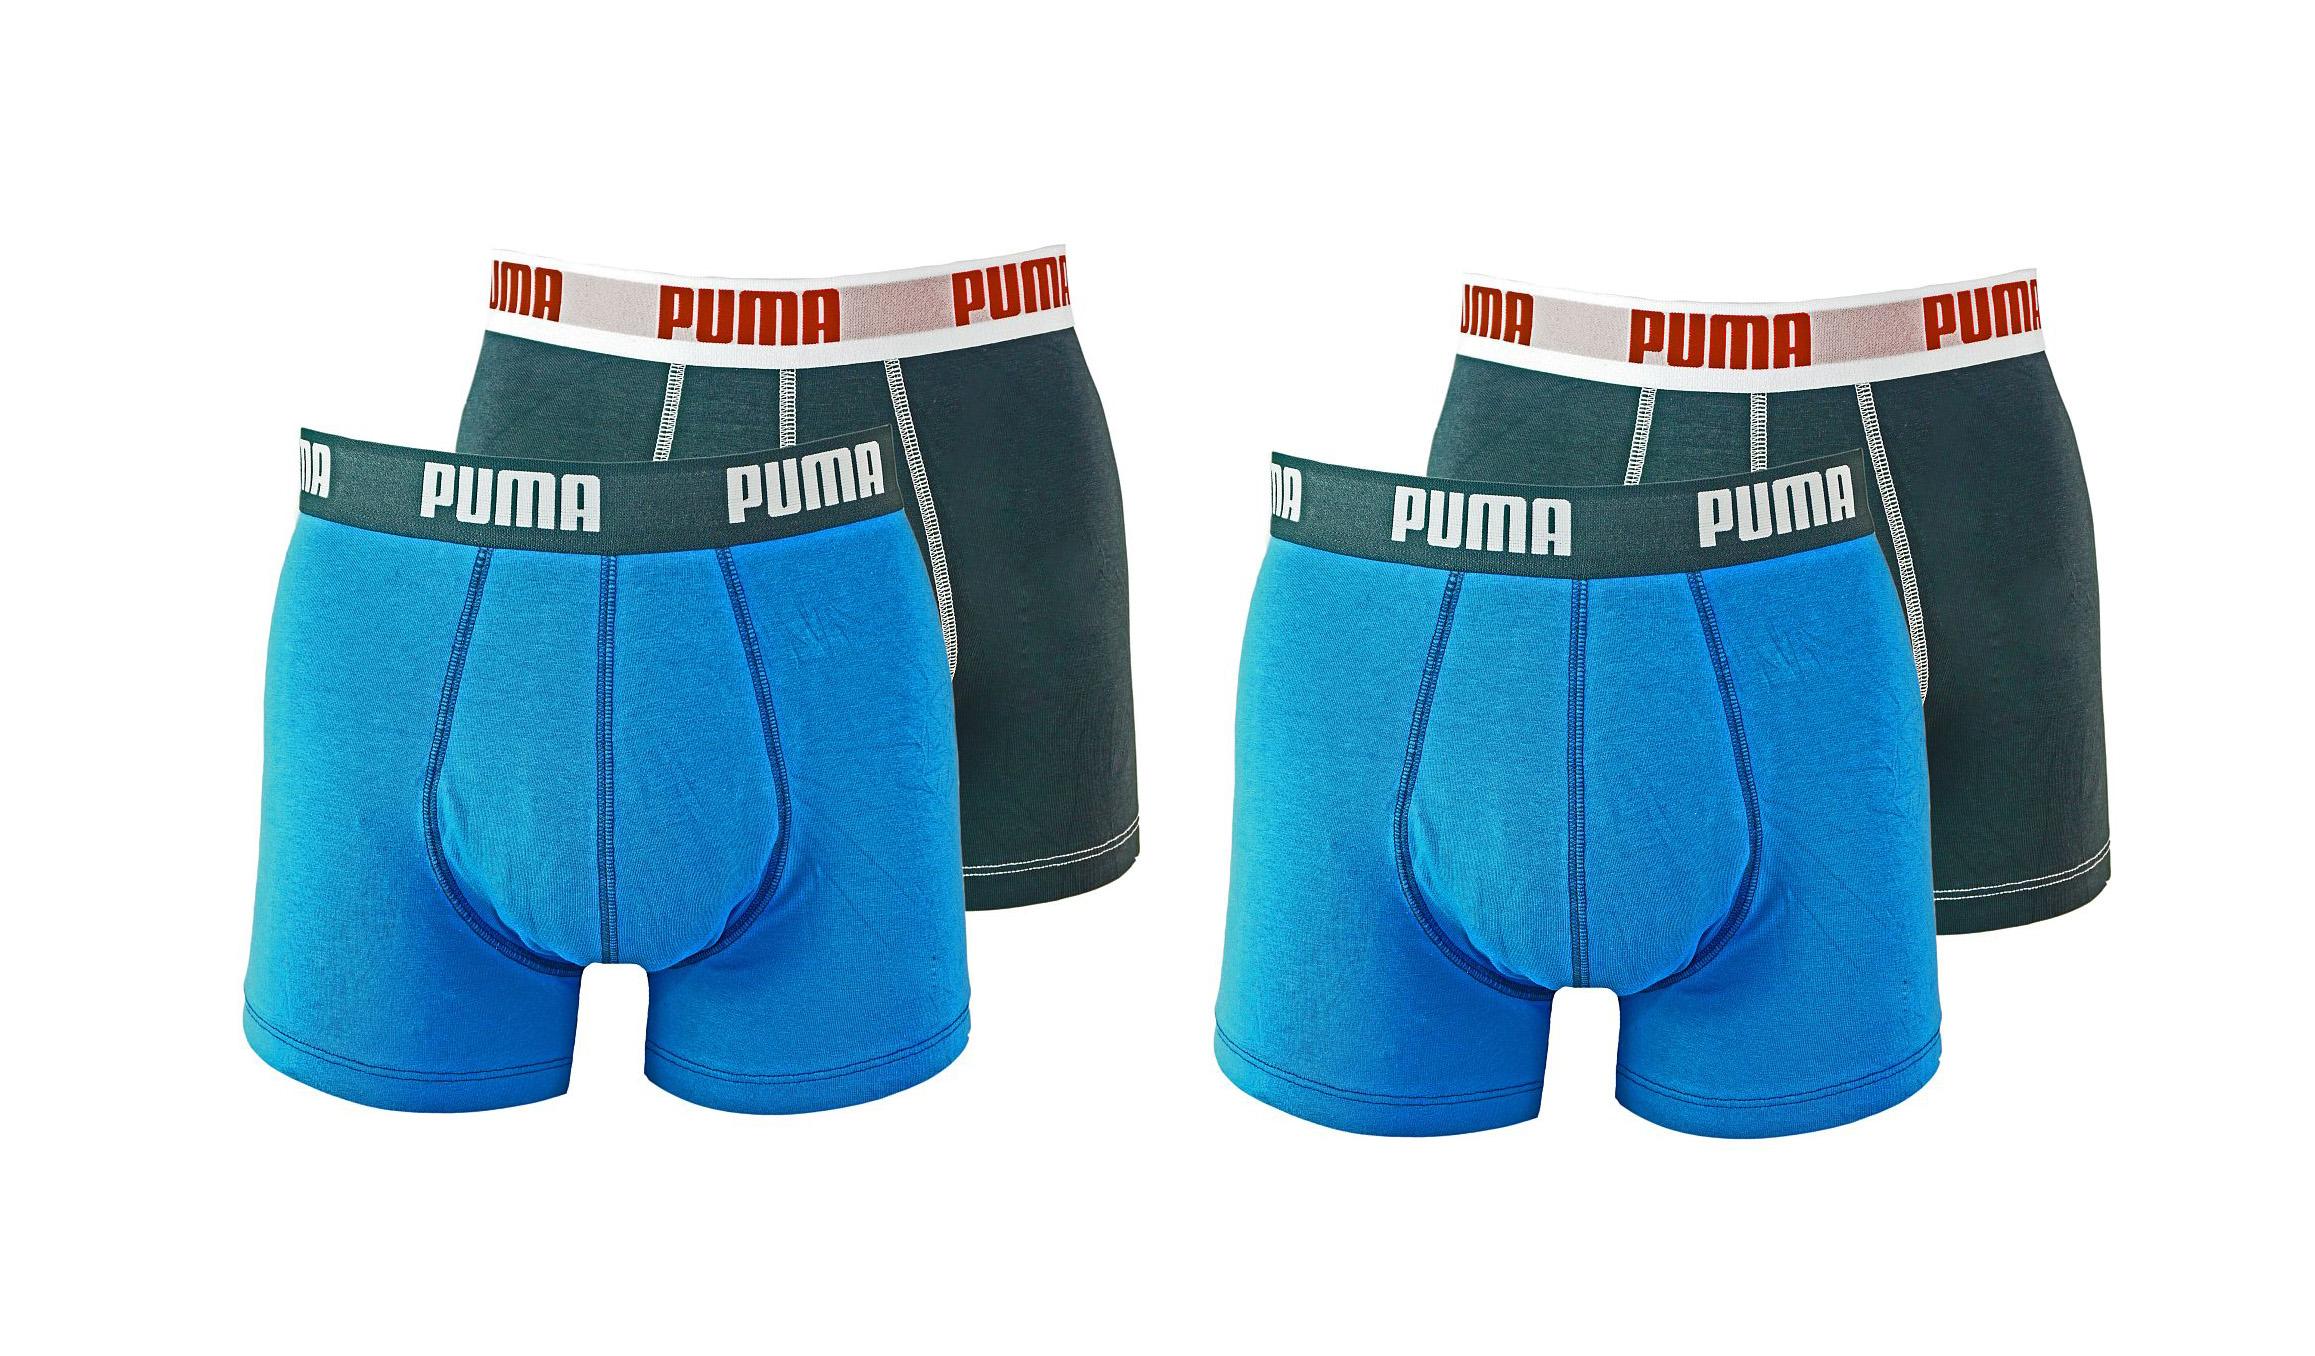 PUMA Shorts Unterhosen 2 x 2er Pack Boxer 521015001 056 020 blue SF17-PMS2